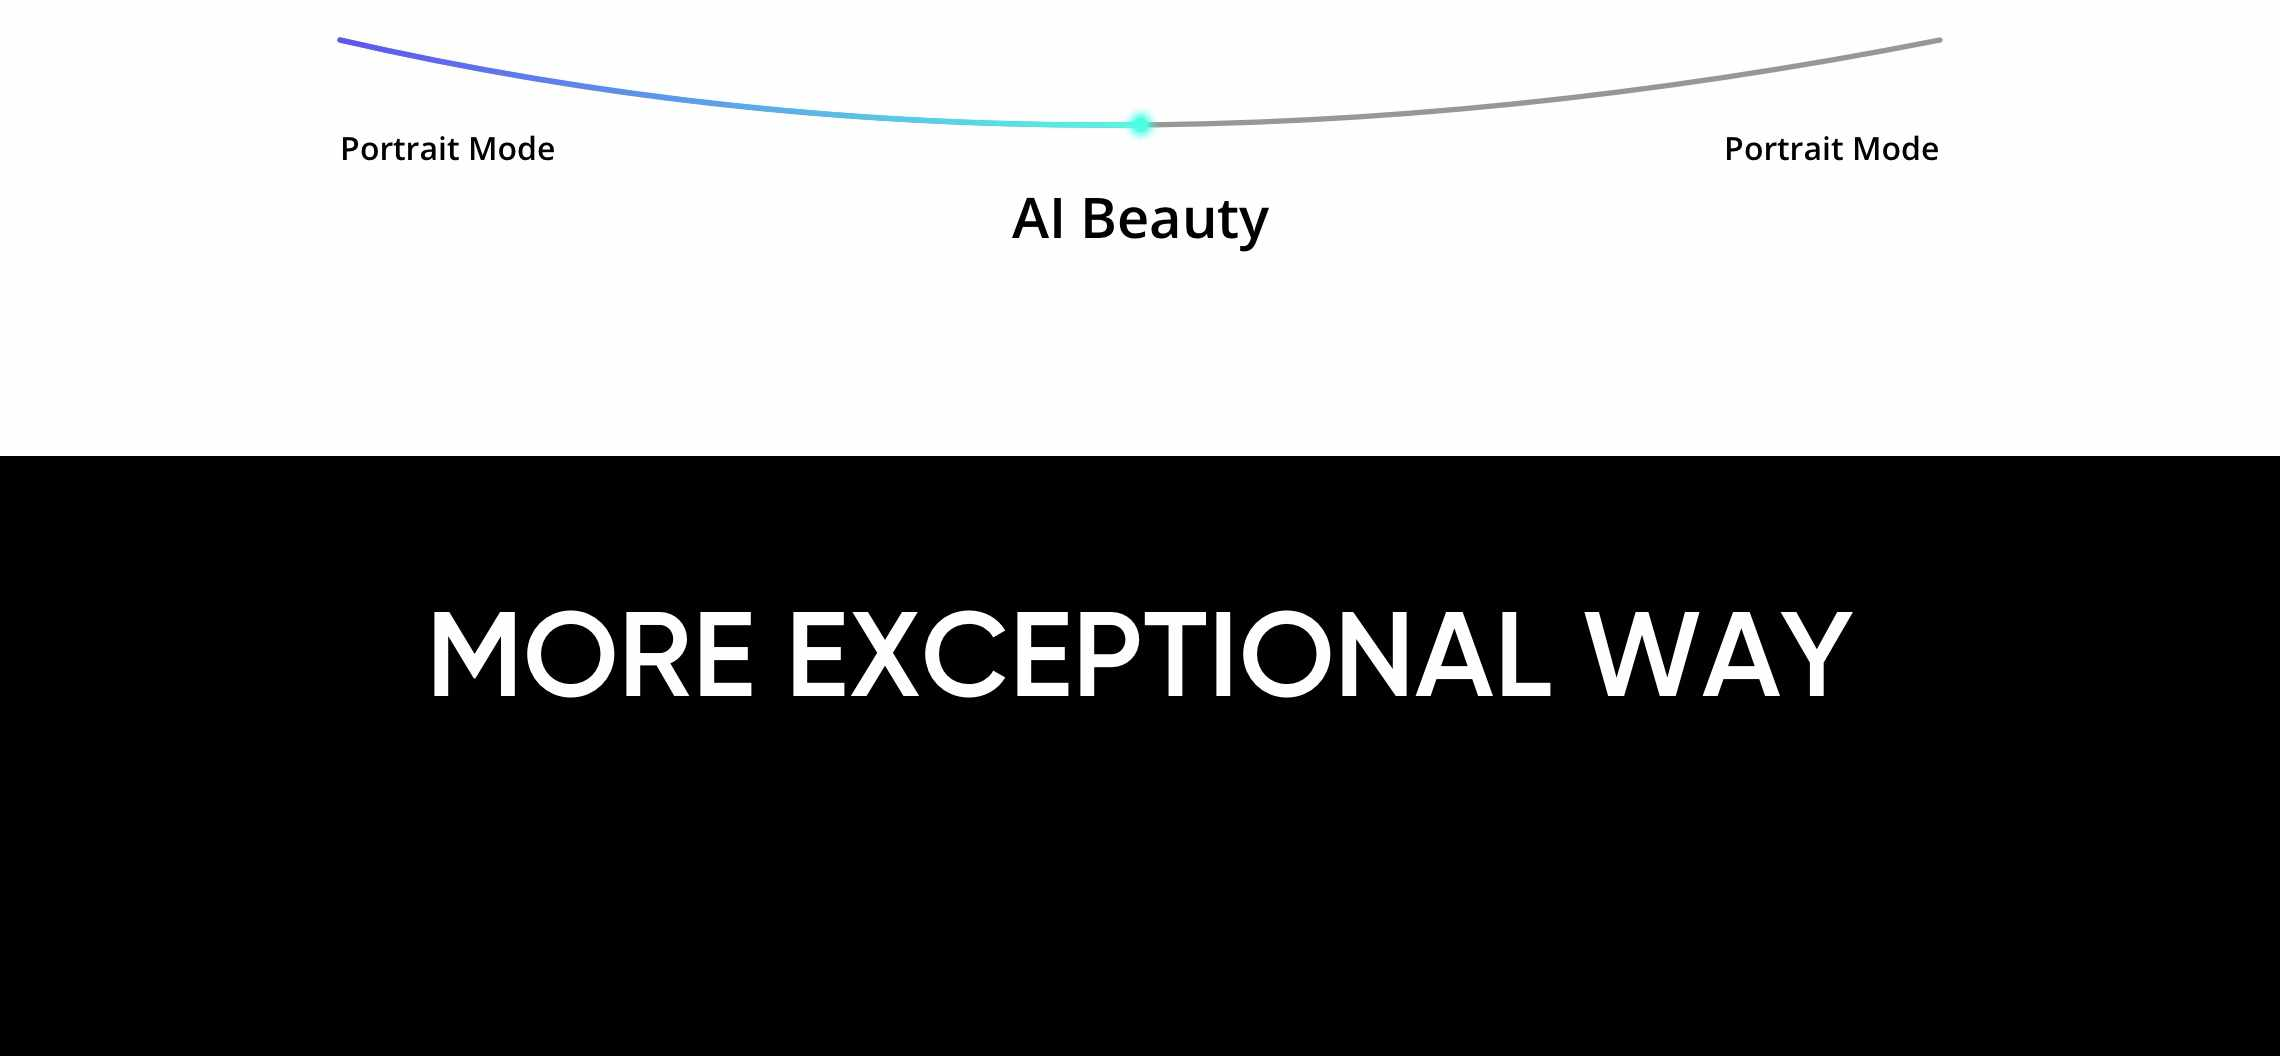 Realme AI Beauty